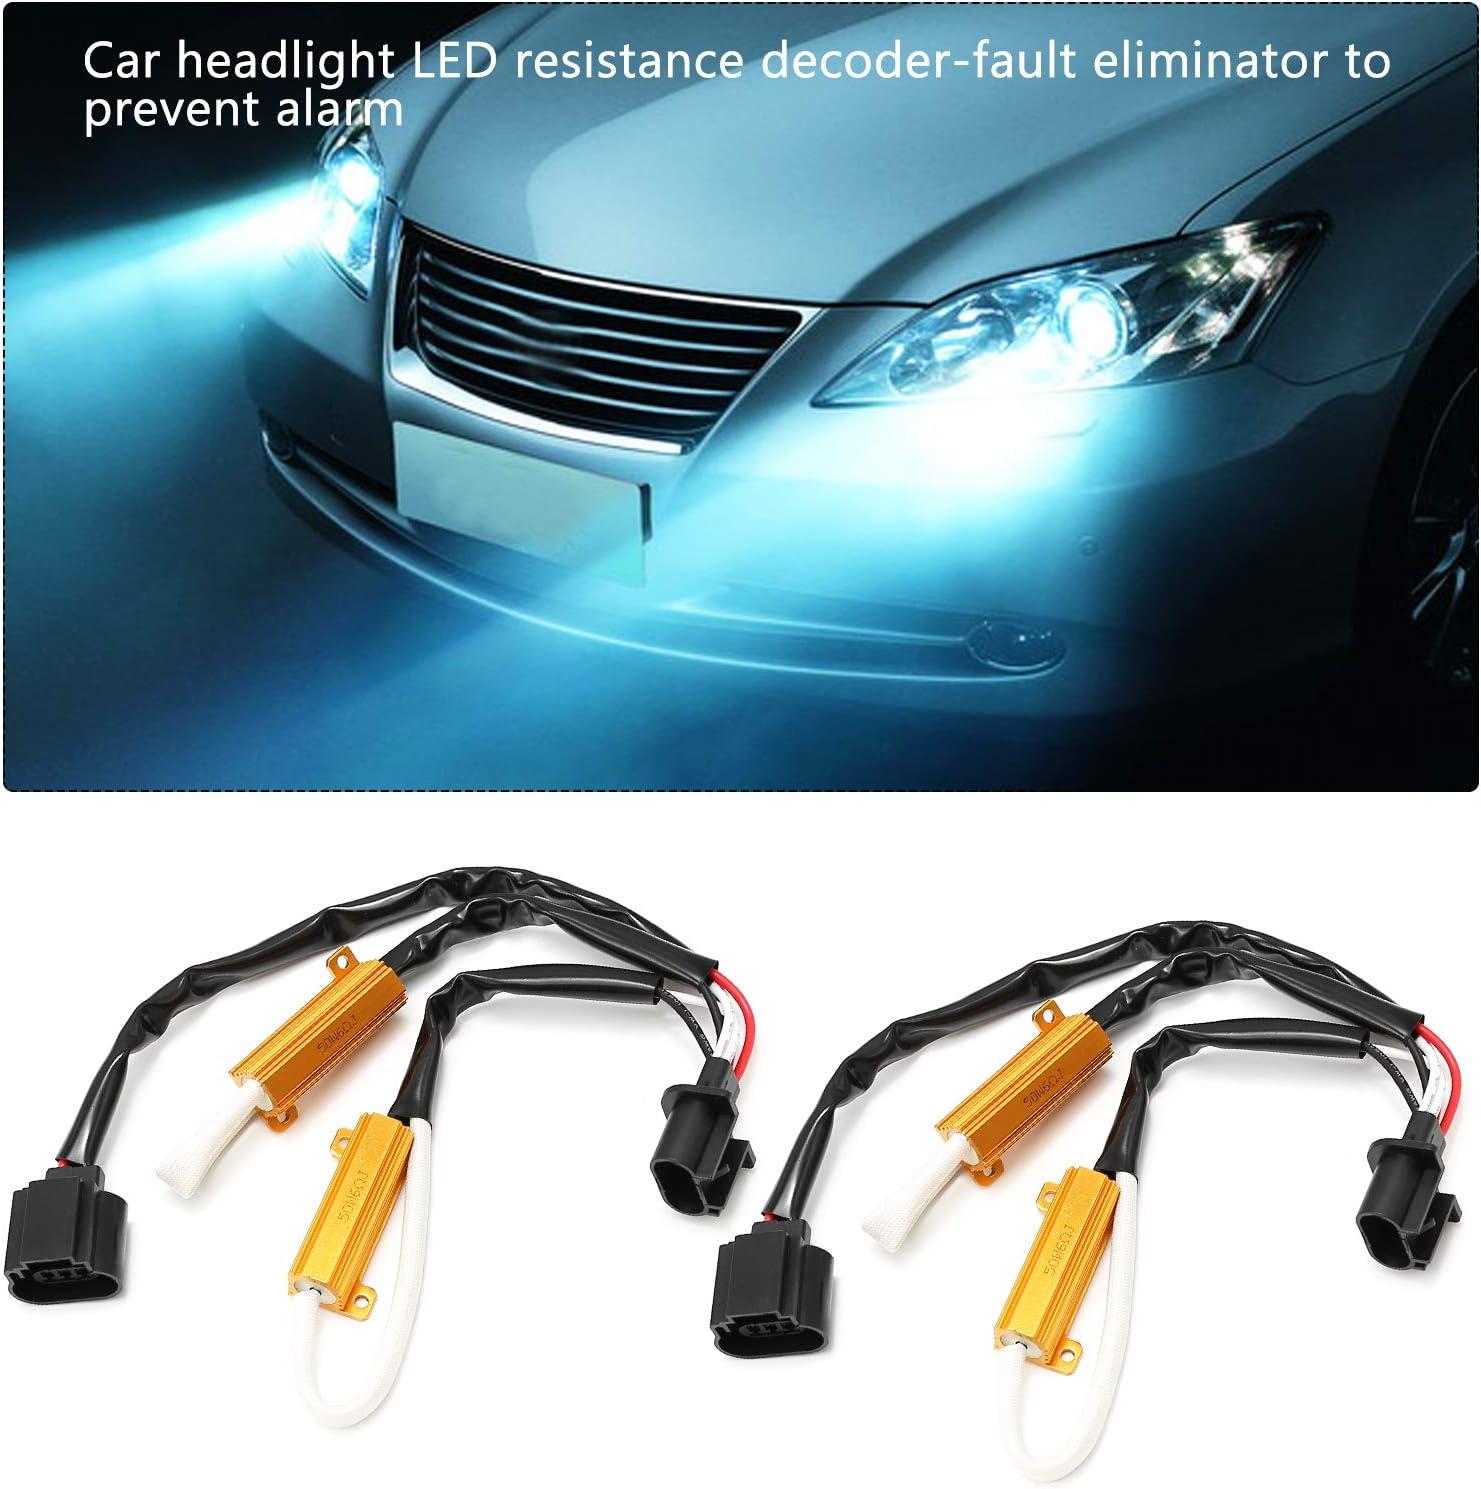 Anti Flicker Error Decoder Warning Canceler 50W 6Ohm 2PCS ZUDKSUY LED Resistor Kit 9008//H13 Relay Harness Adapter